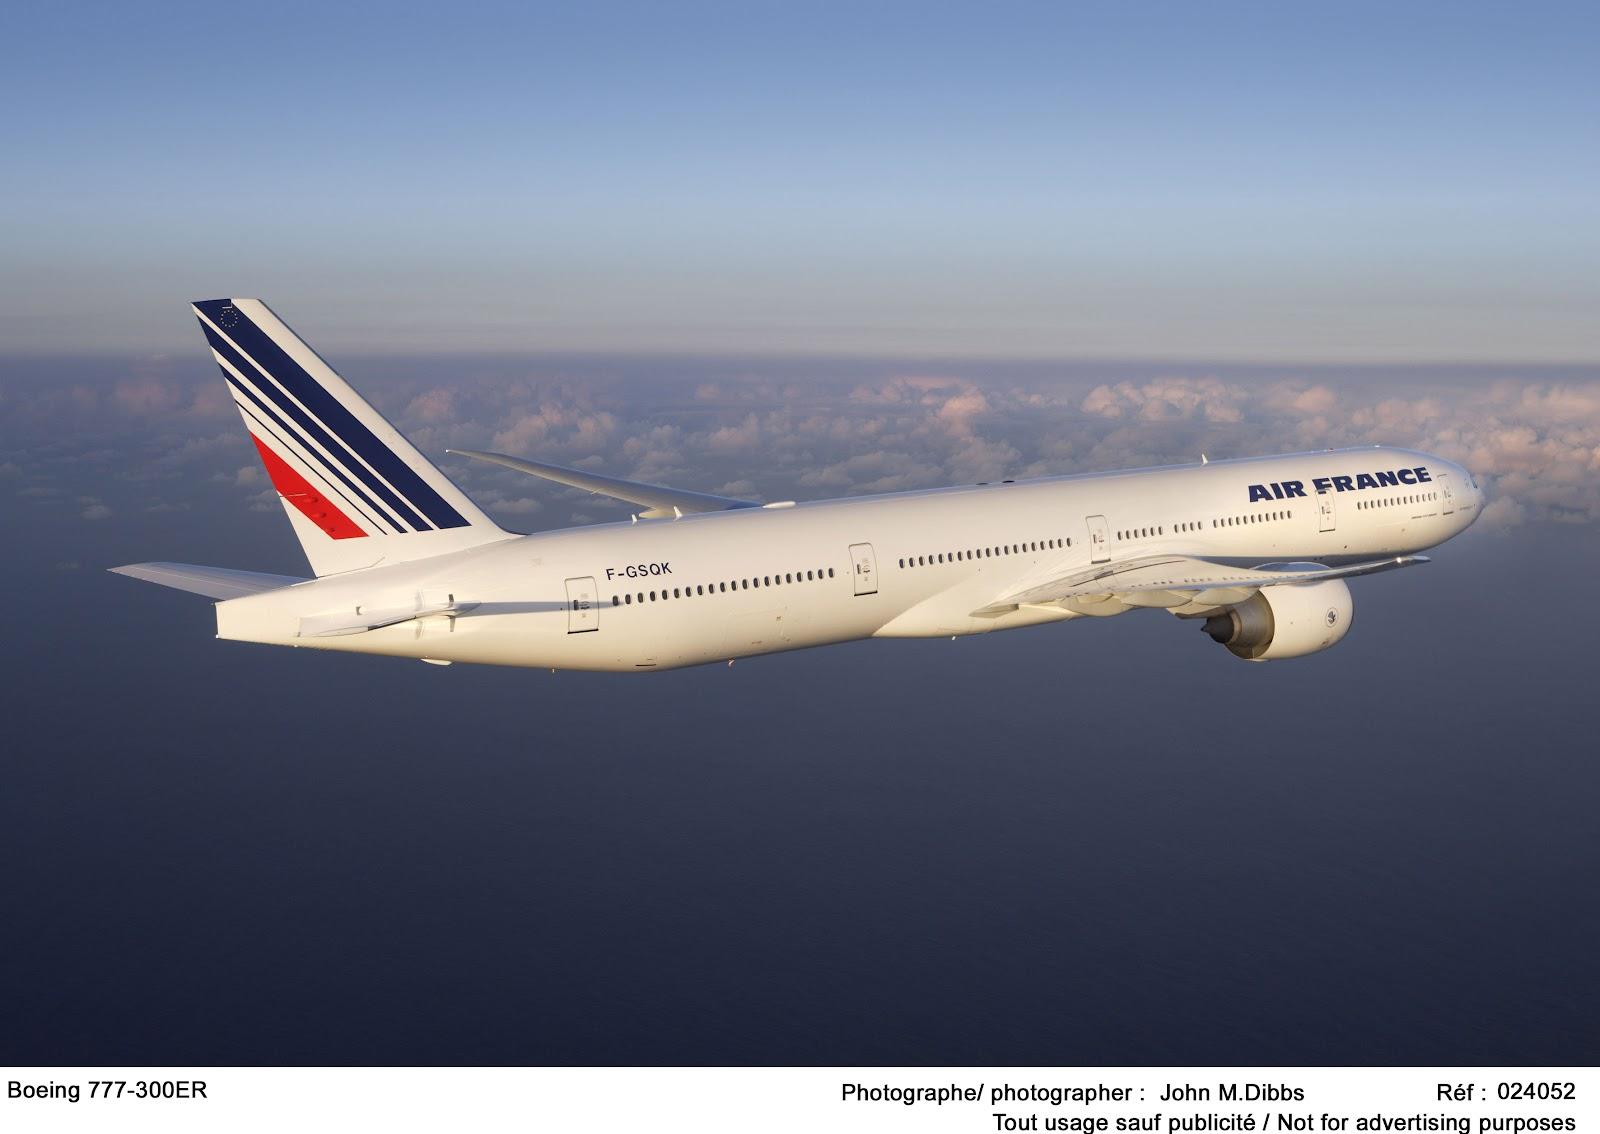 PZ C: boeing 777-300er